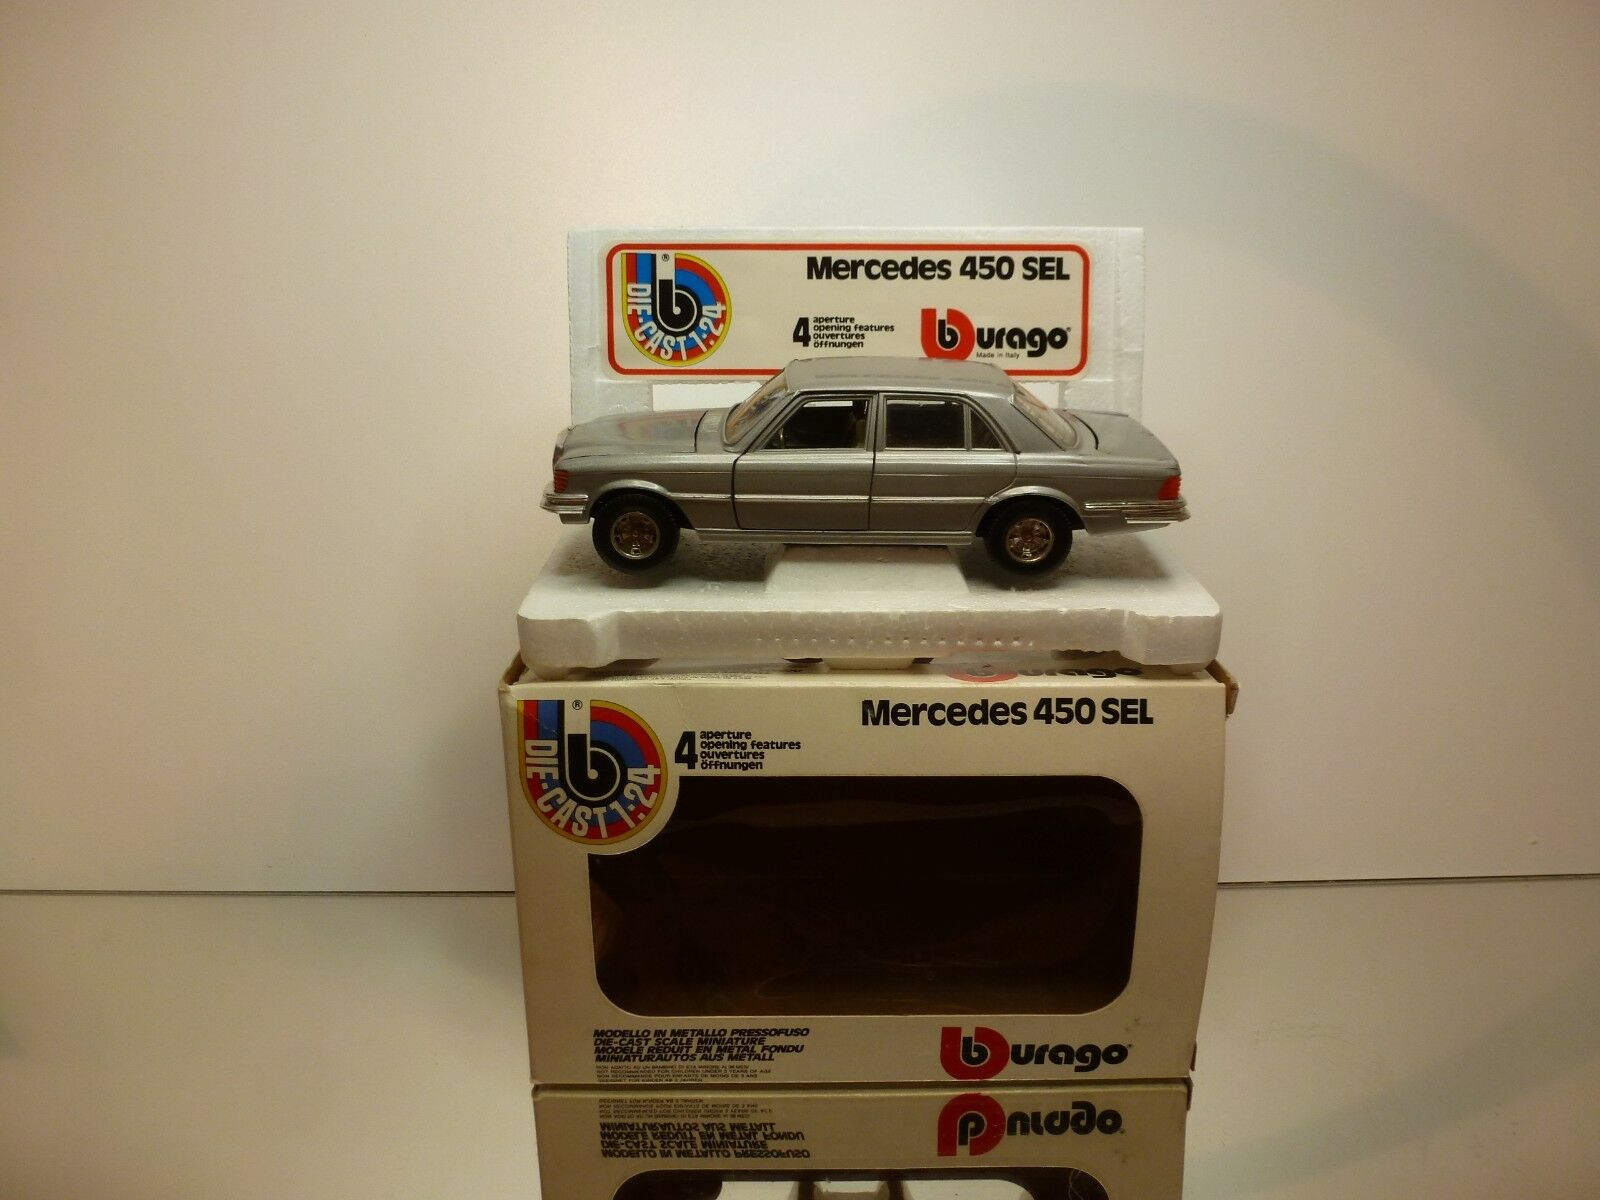 BBURAGO 0122 MERCEDES BENZ 450 SEL - plata 1 1 1 24 - GOOD CONDITION IN BOX a73ddd